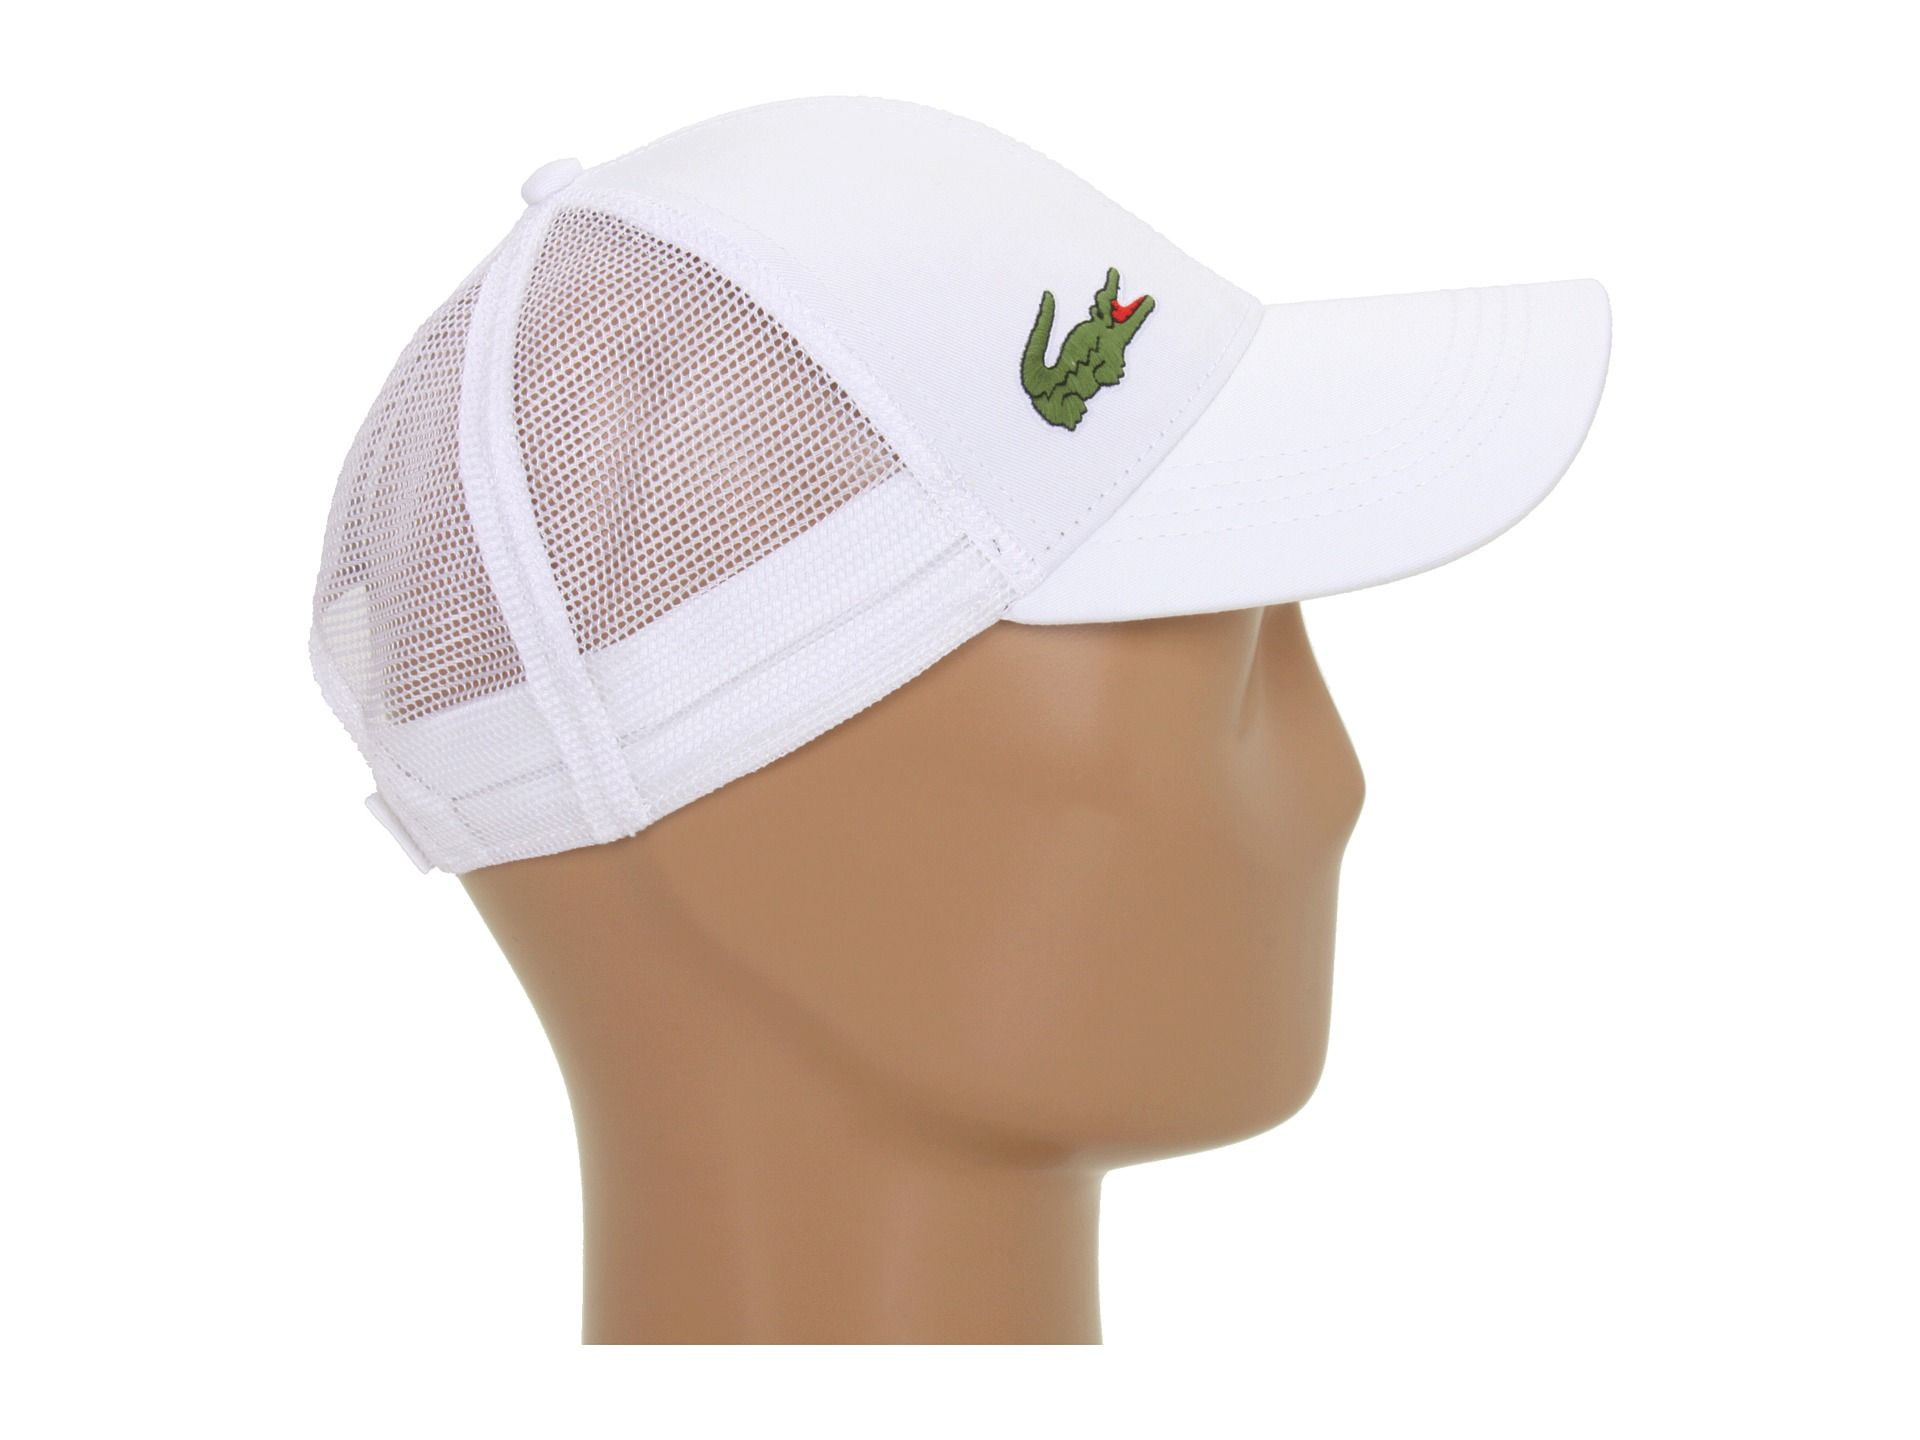 lacoste classic 5cm croc trucker hat at zappos